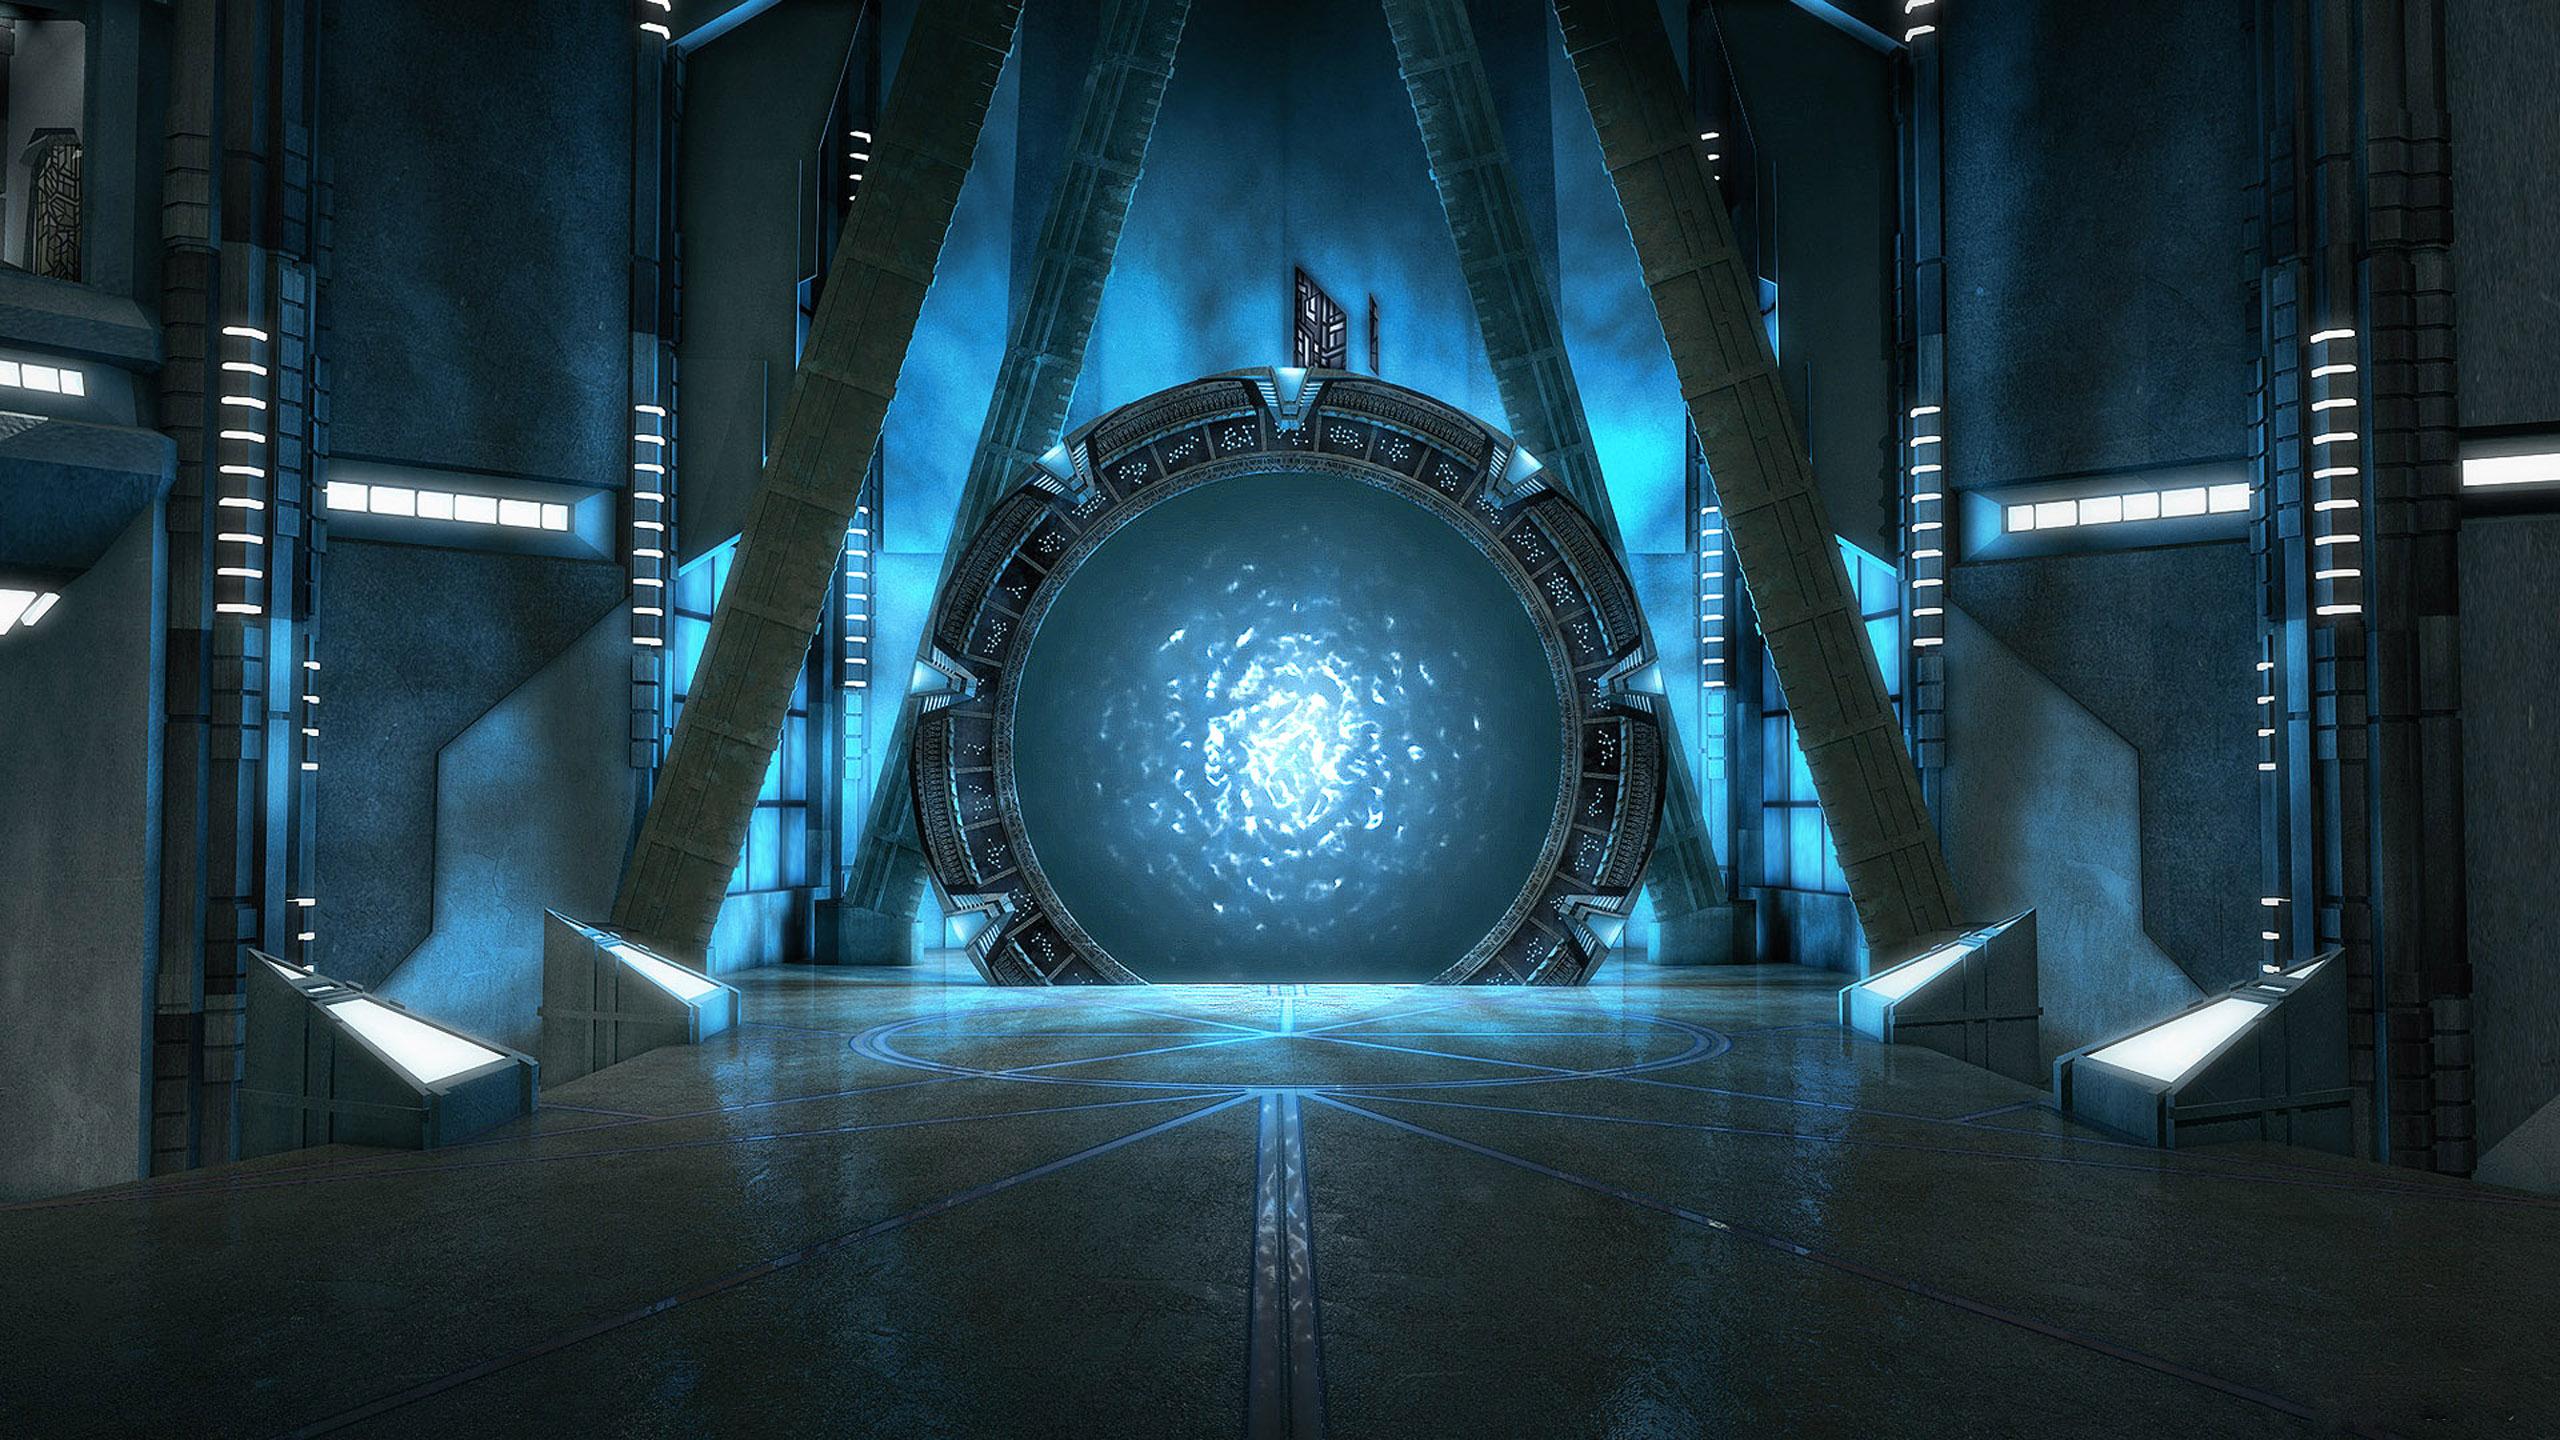 Free Sci Fi Fantasy Desktop Wallpaper: Free Desktop Wallpapers For Widescreen